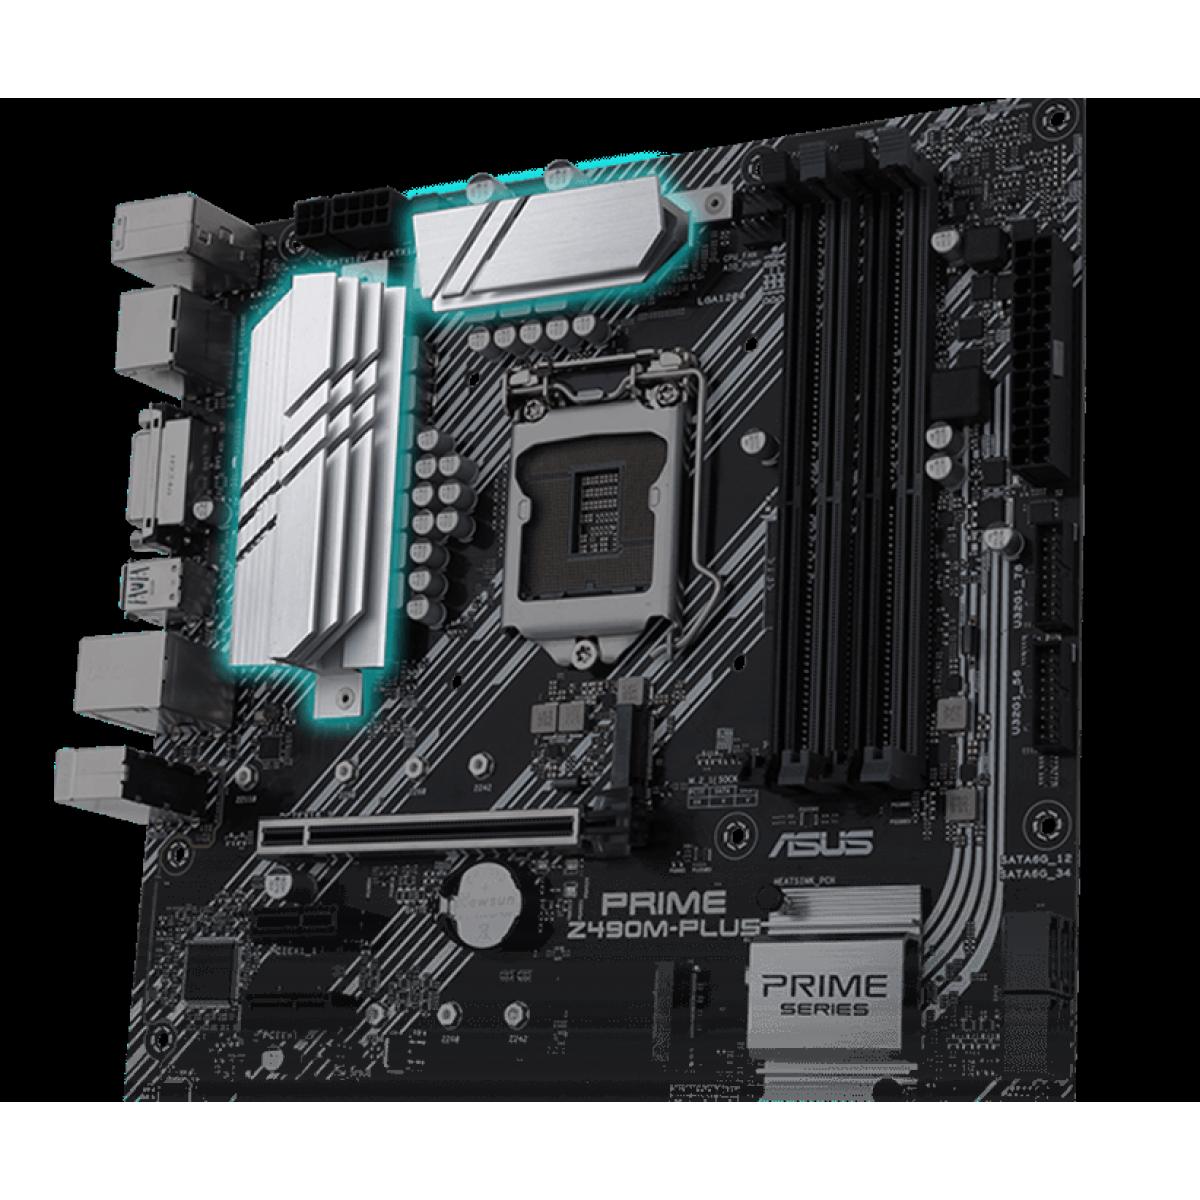 Placa Mãe ASUS PRIME Z490M-PLUS, Chipset Z490, Intel LGA 1200, mATX, DDR4